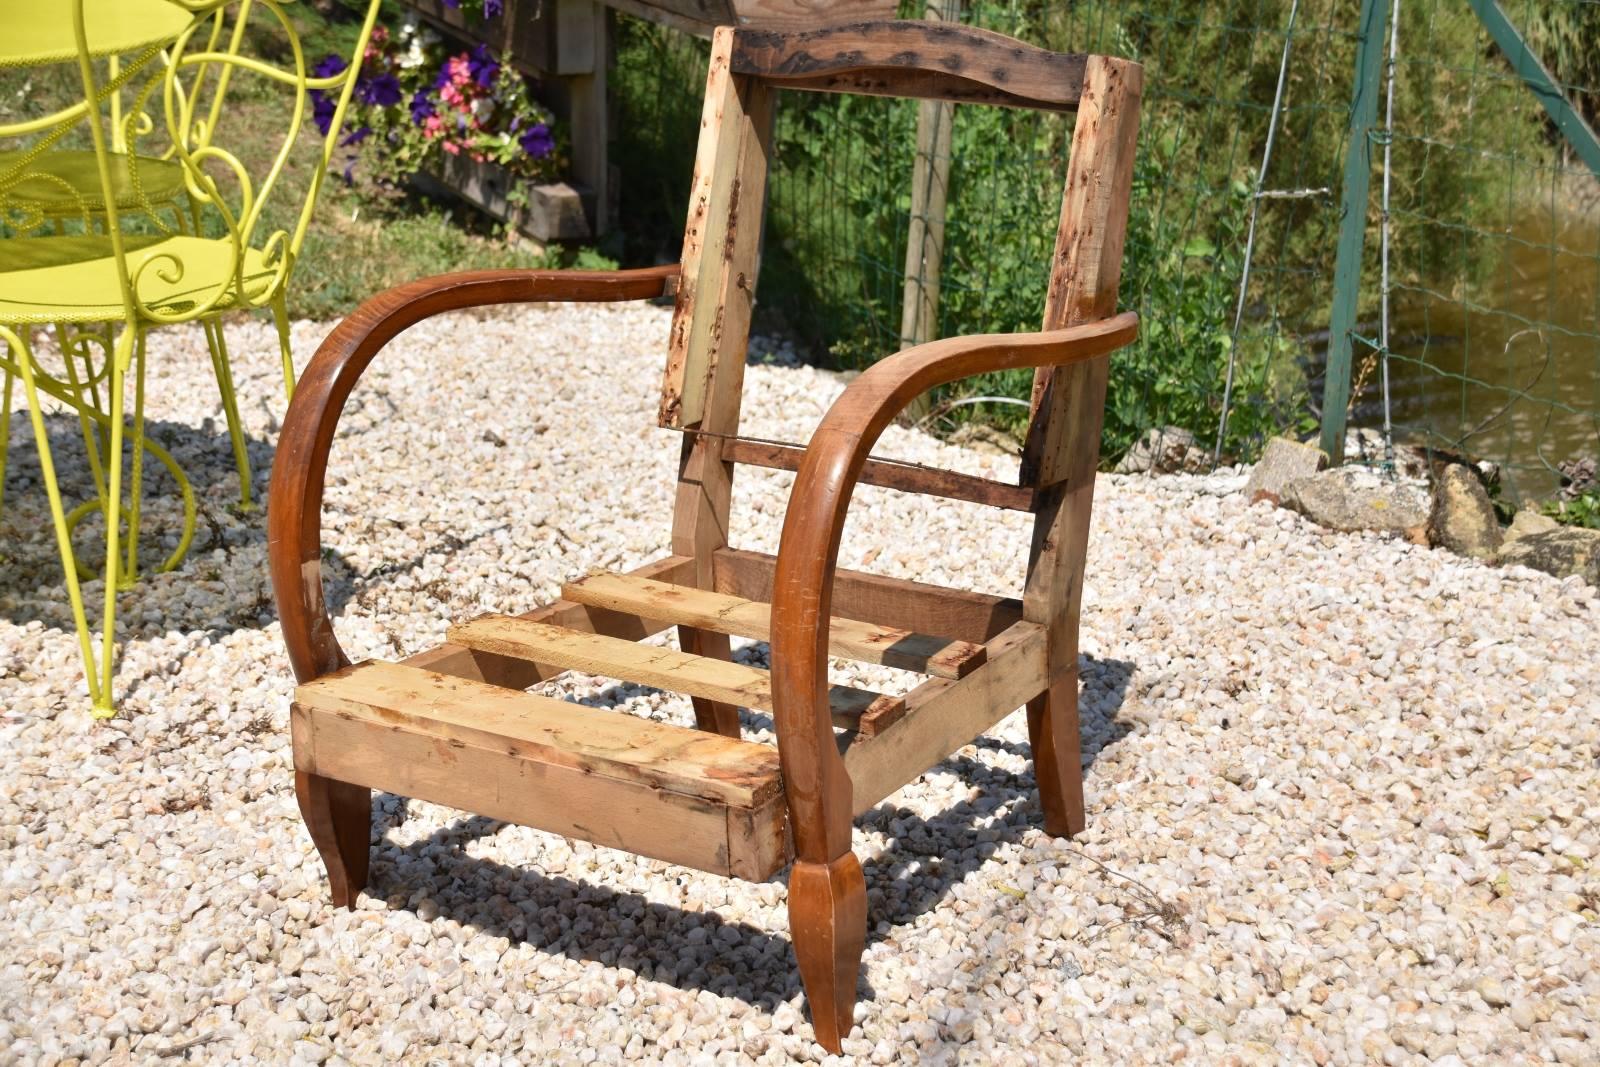 03 nieuwe stoel